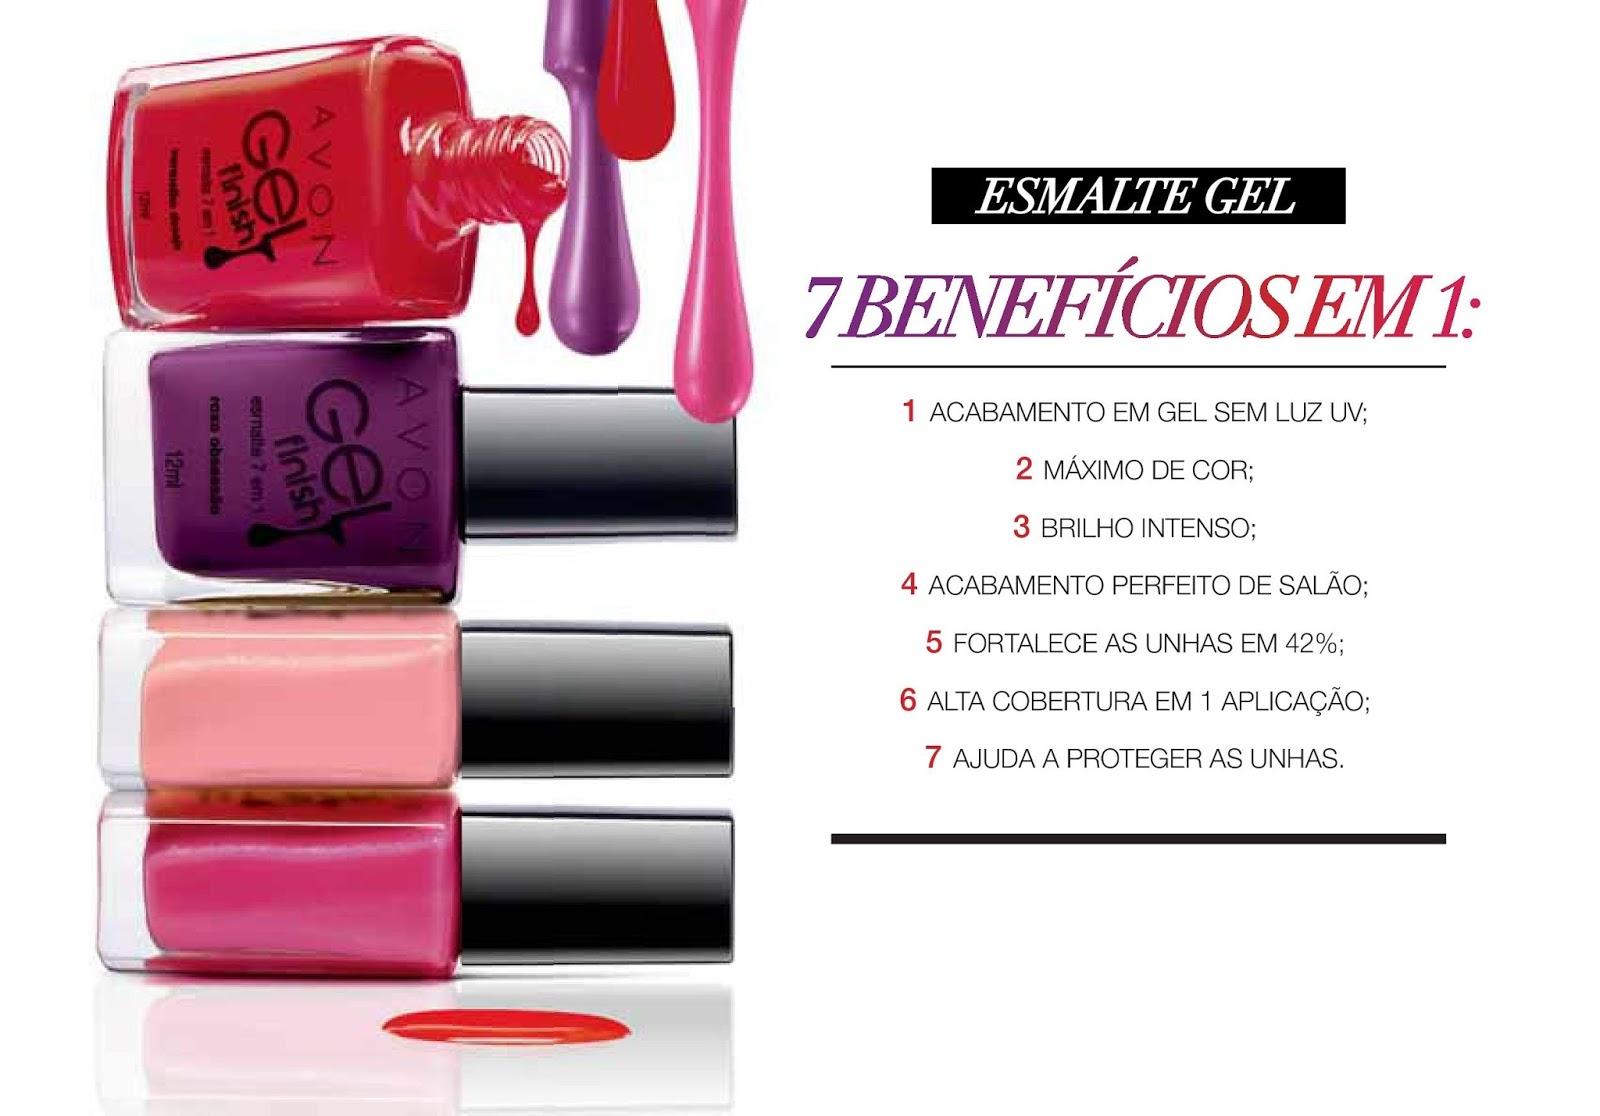 Esmalte Avon Gel Finish :: Vinho Fashion - Resenha